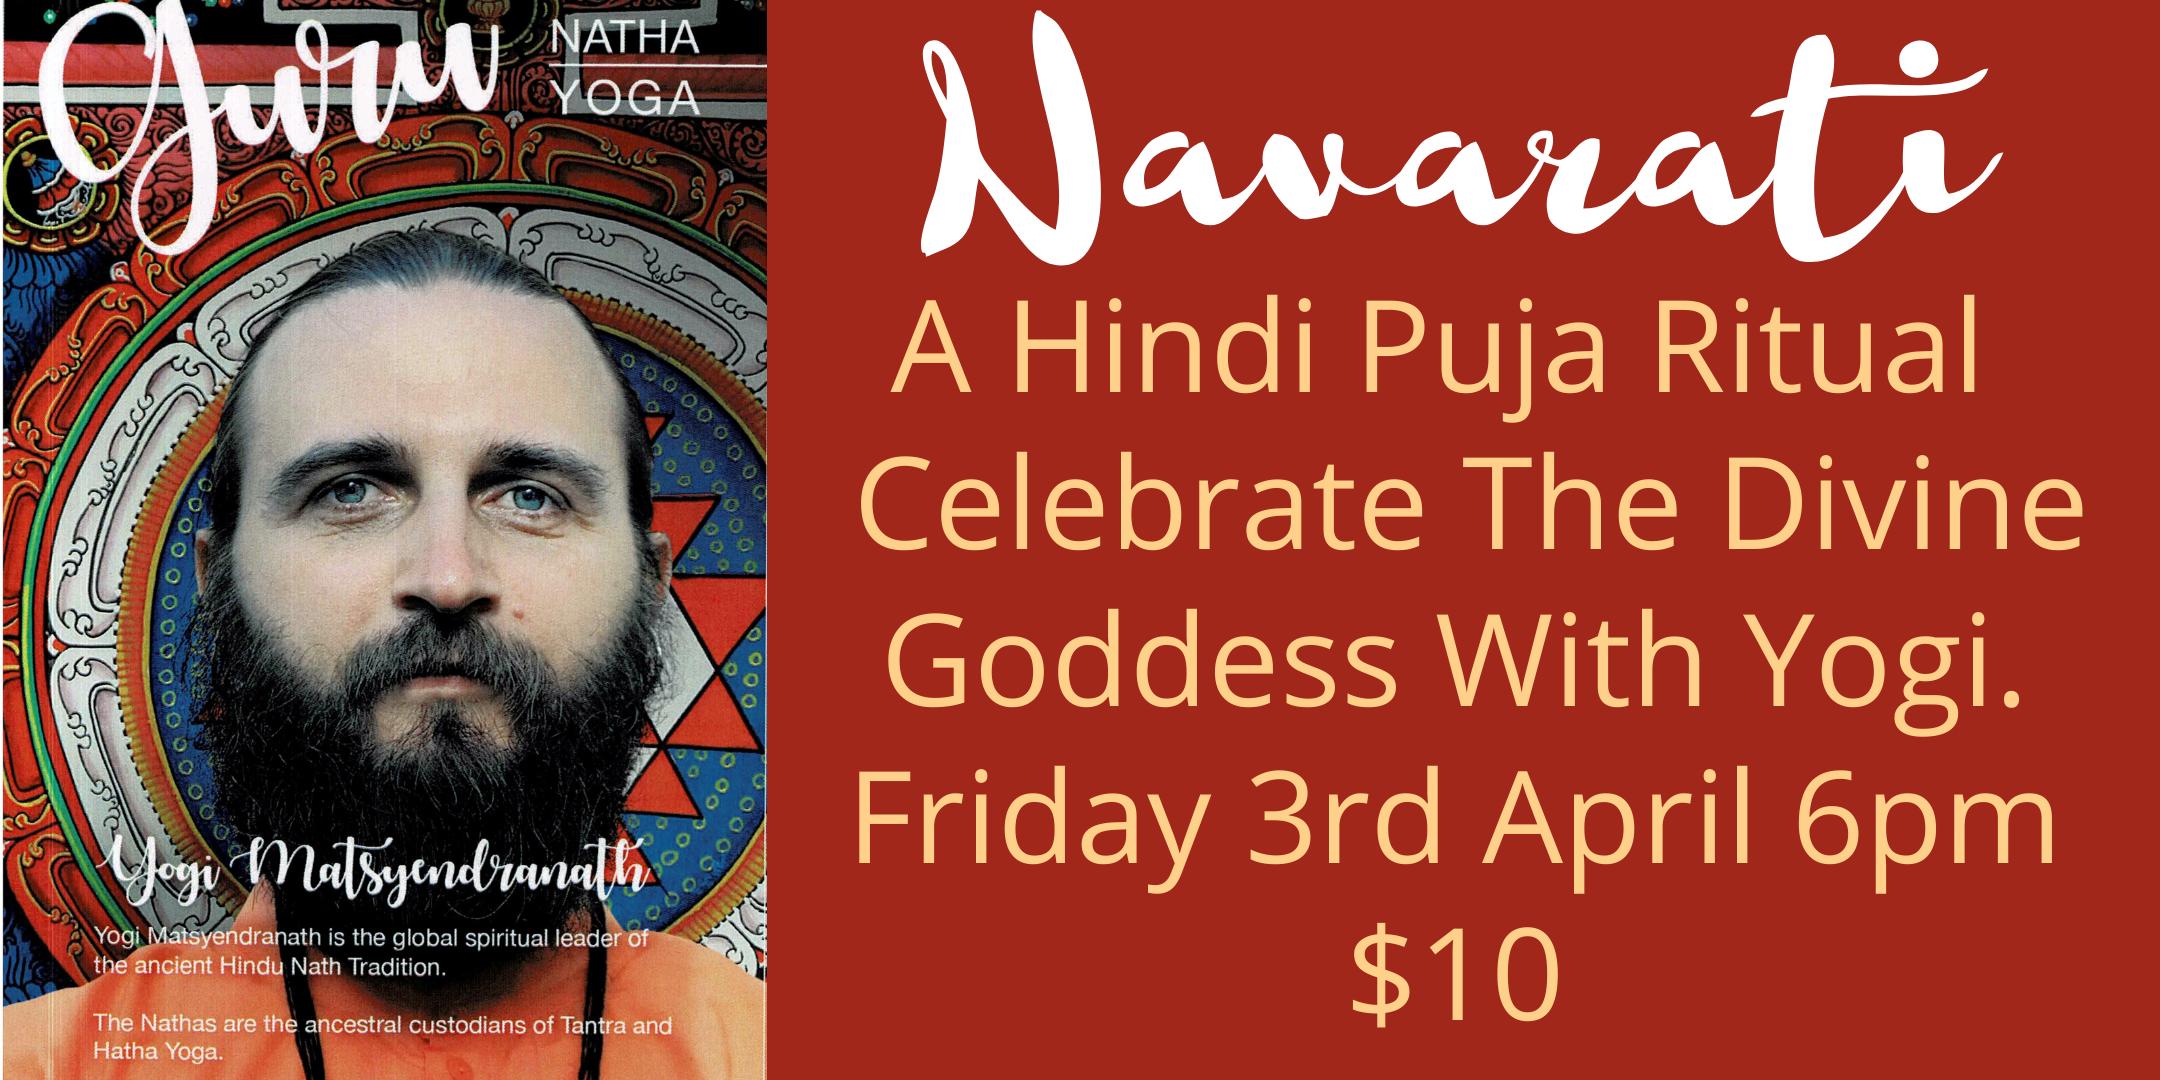 Navarti, Hindu Puja Ritual To Celebrate The Divine Goddess.